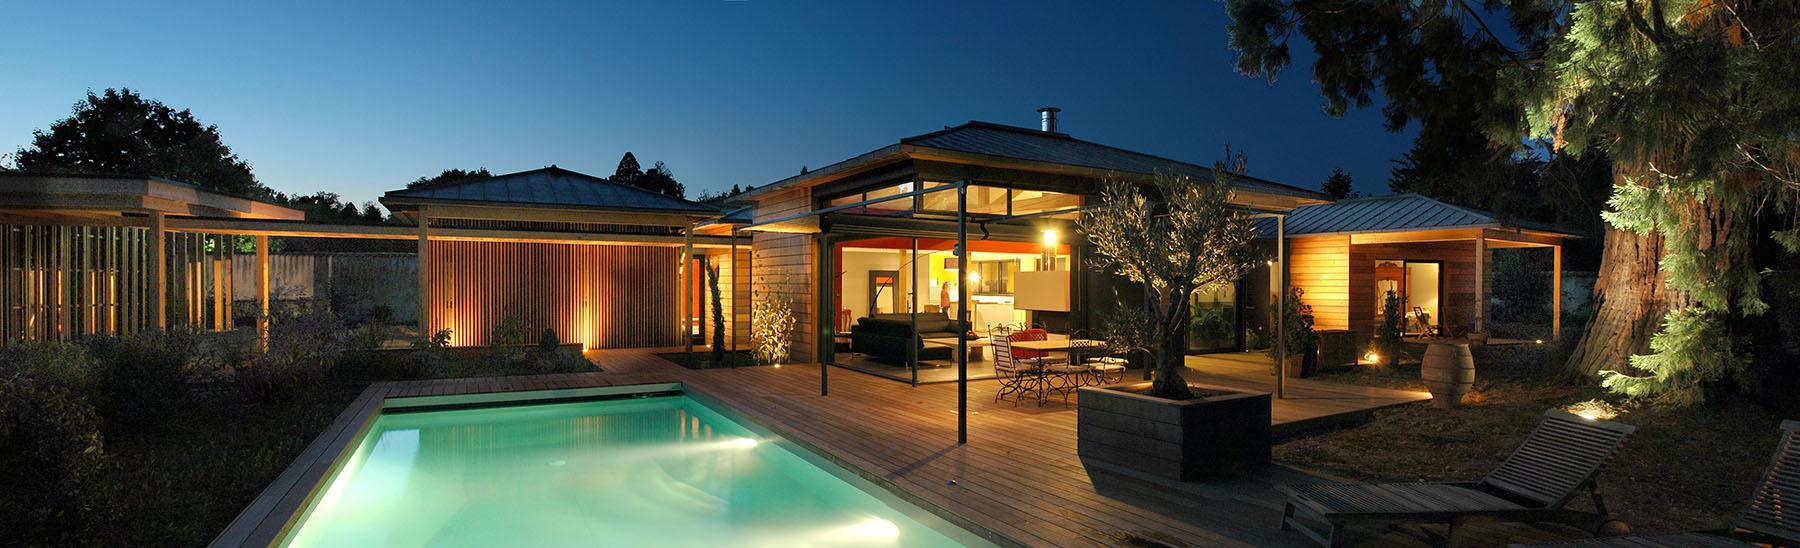 angles ouverts 2010 1er prix des internautes viebois. Black Bedroom Furniture Sets. Home Design Ideas